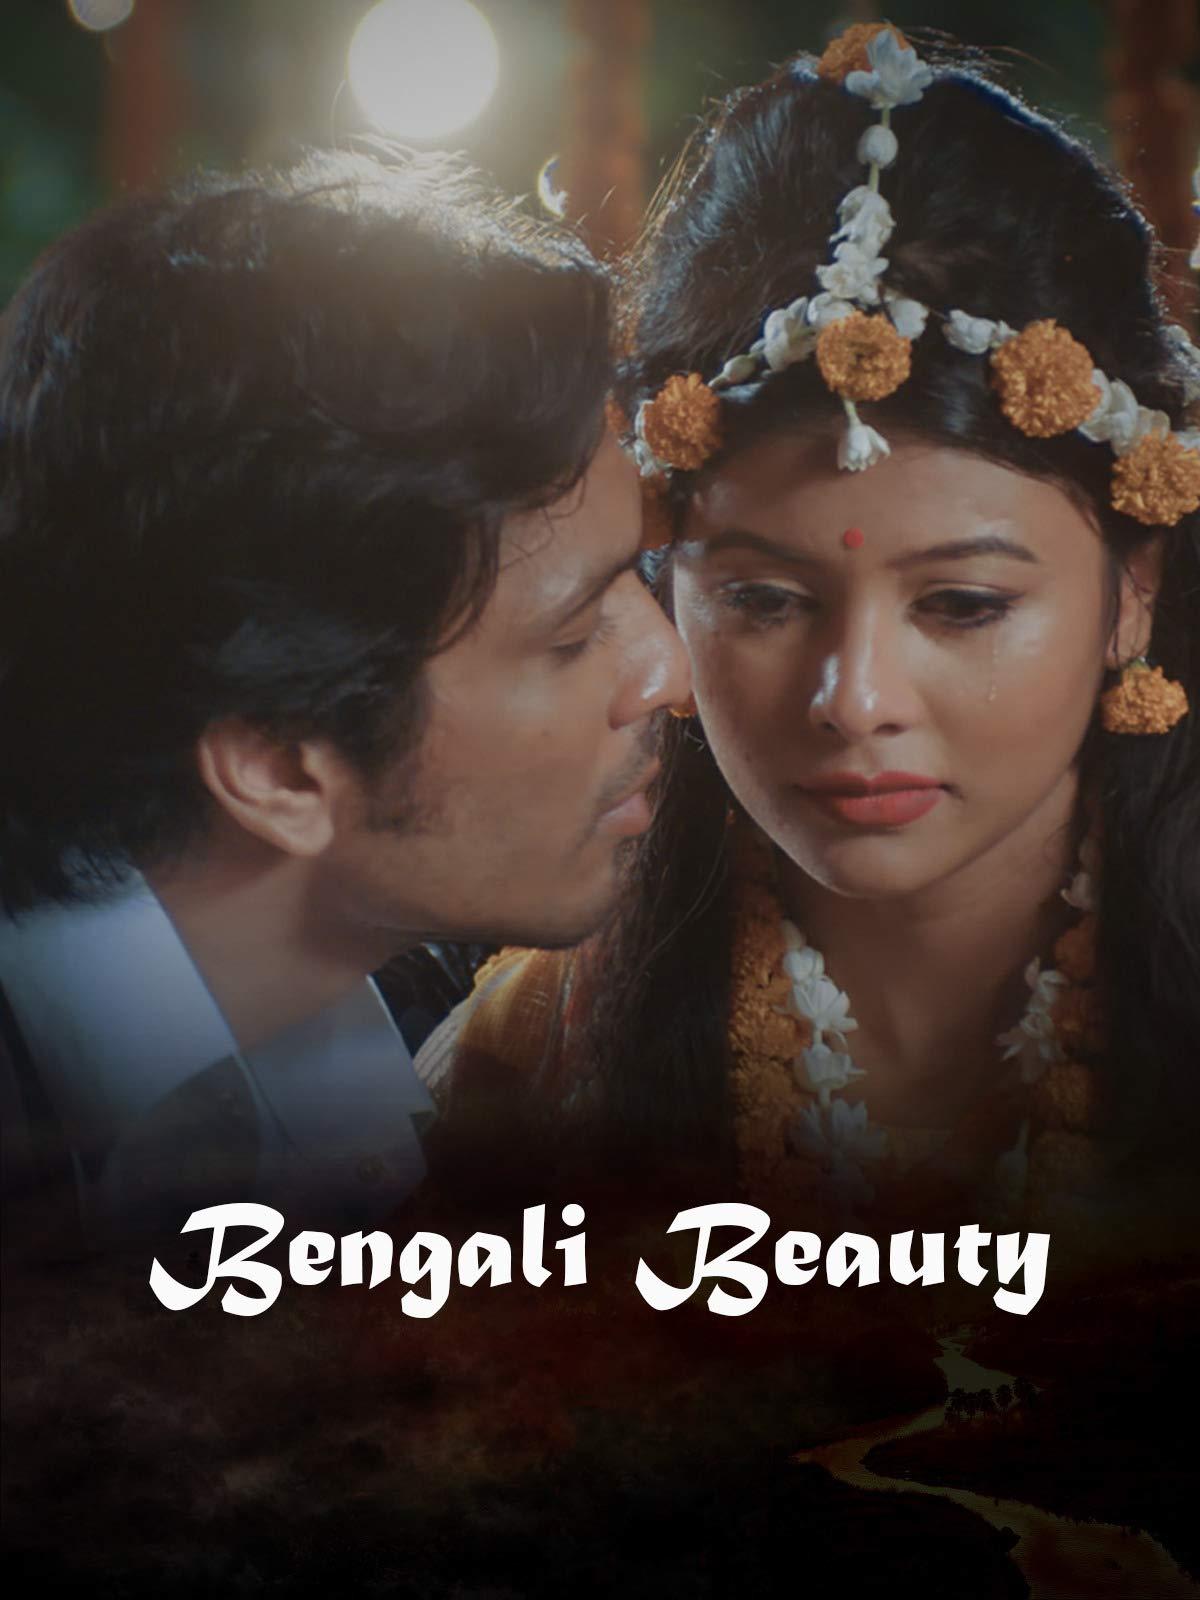 Amazon.com: Bengali Beauty: Rahsaan Noor, Mumtaheena Toya, Sarah Alam,  Ashfique Rizwan